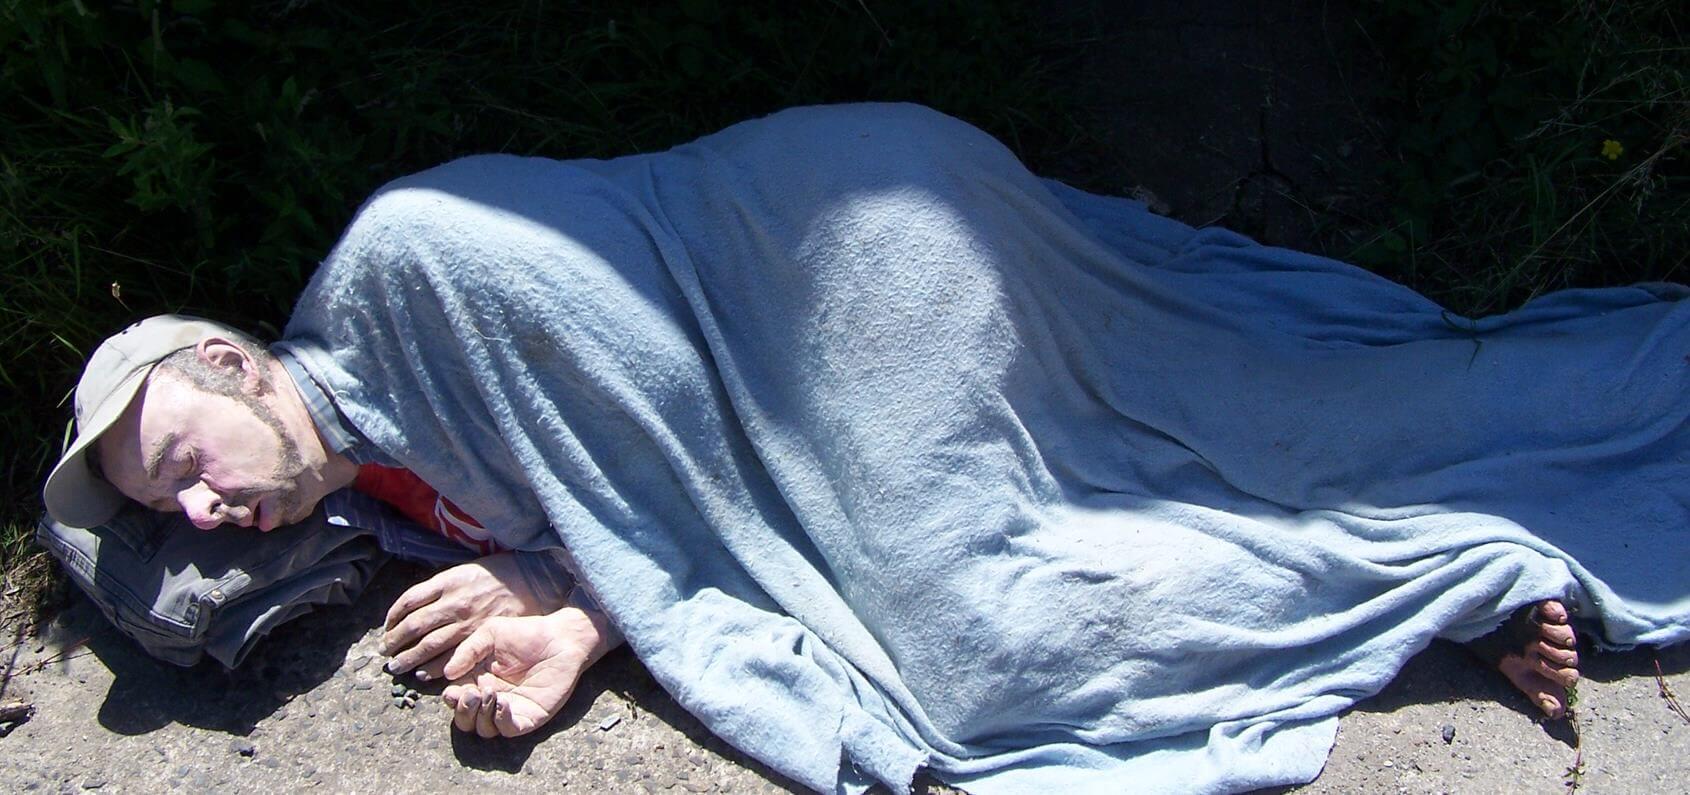 Invisible-Sleeper-Richard-Austin-sculpture